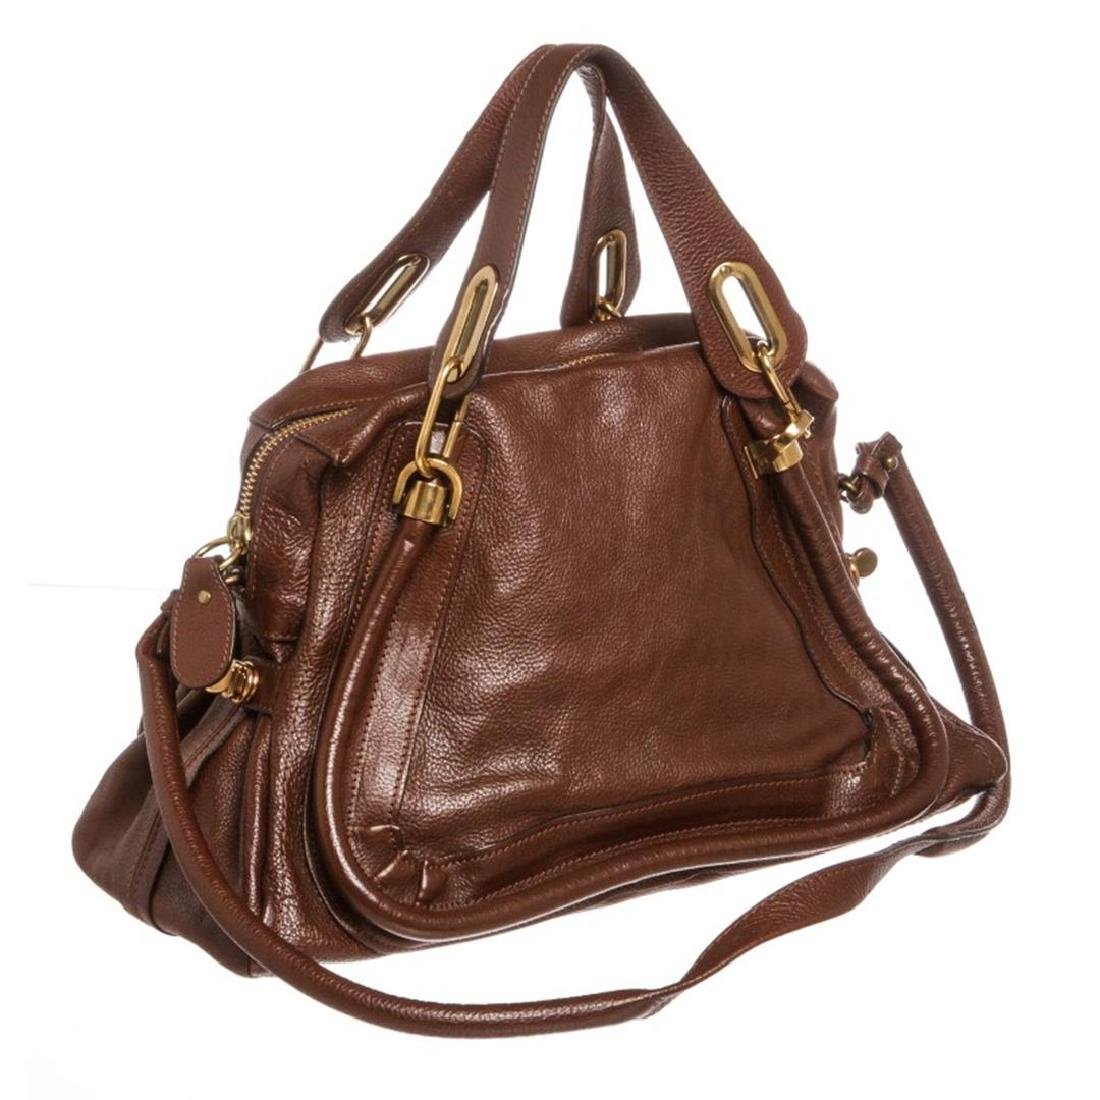 Chloe Brown Leather Paraty Medium Satchel Handbag - 2